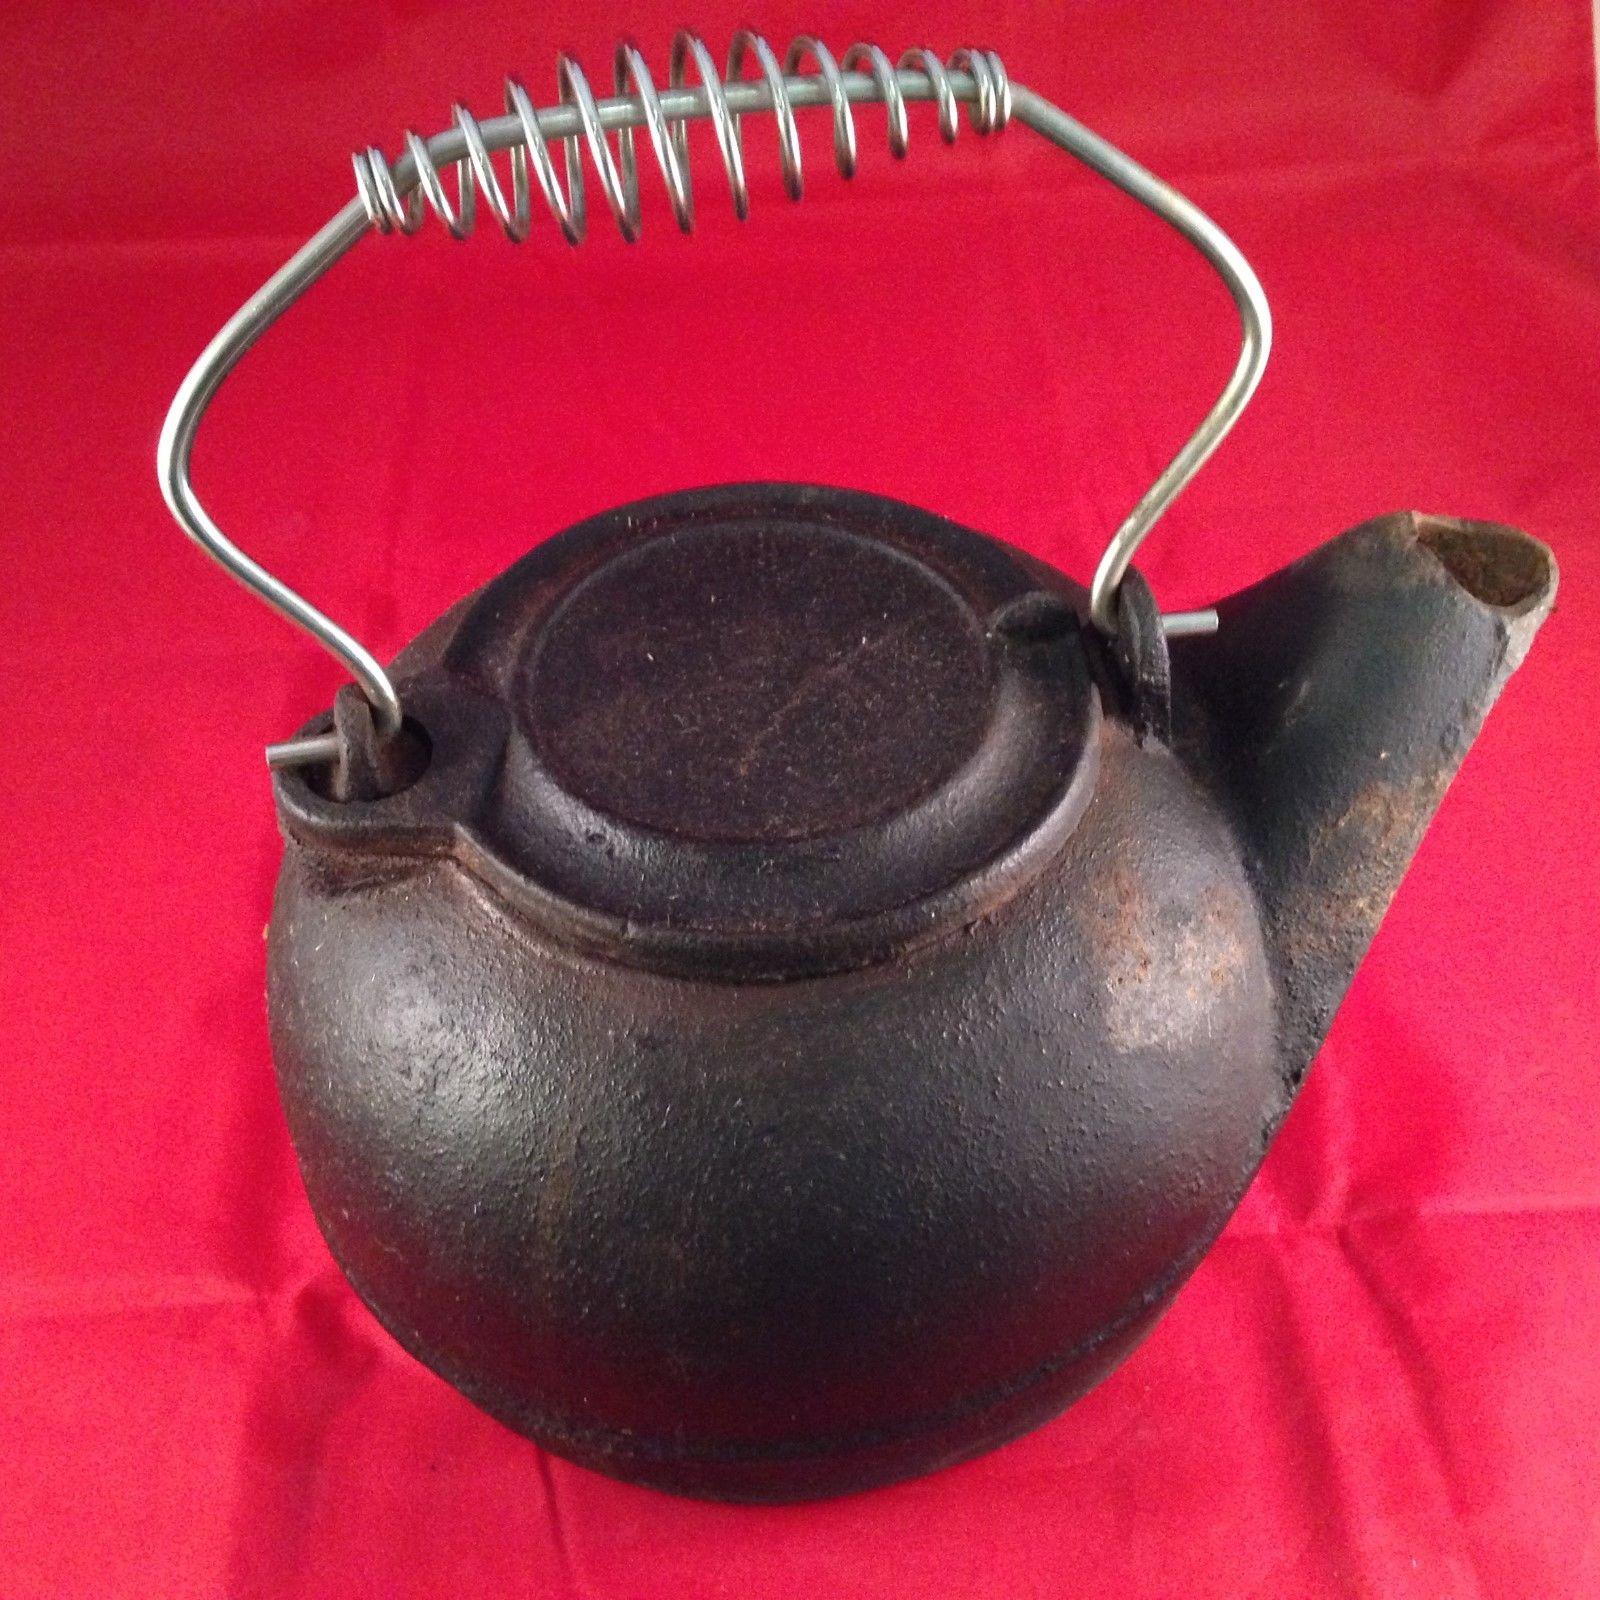 kettle pots